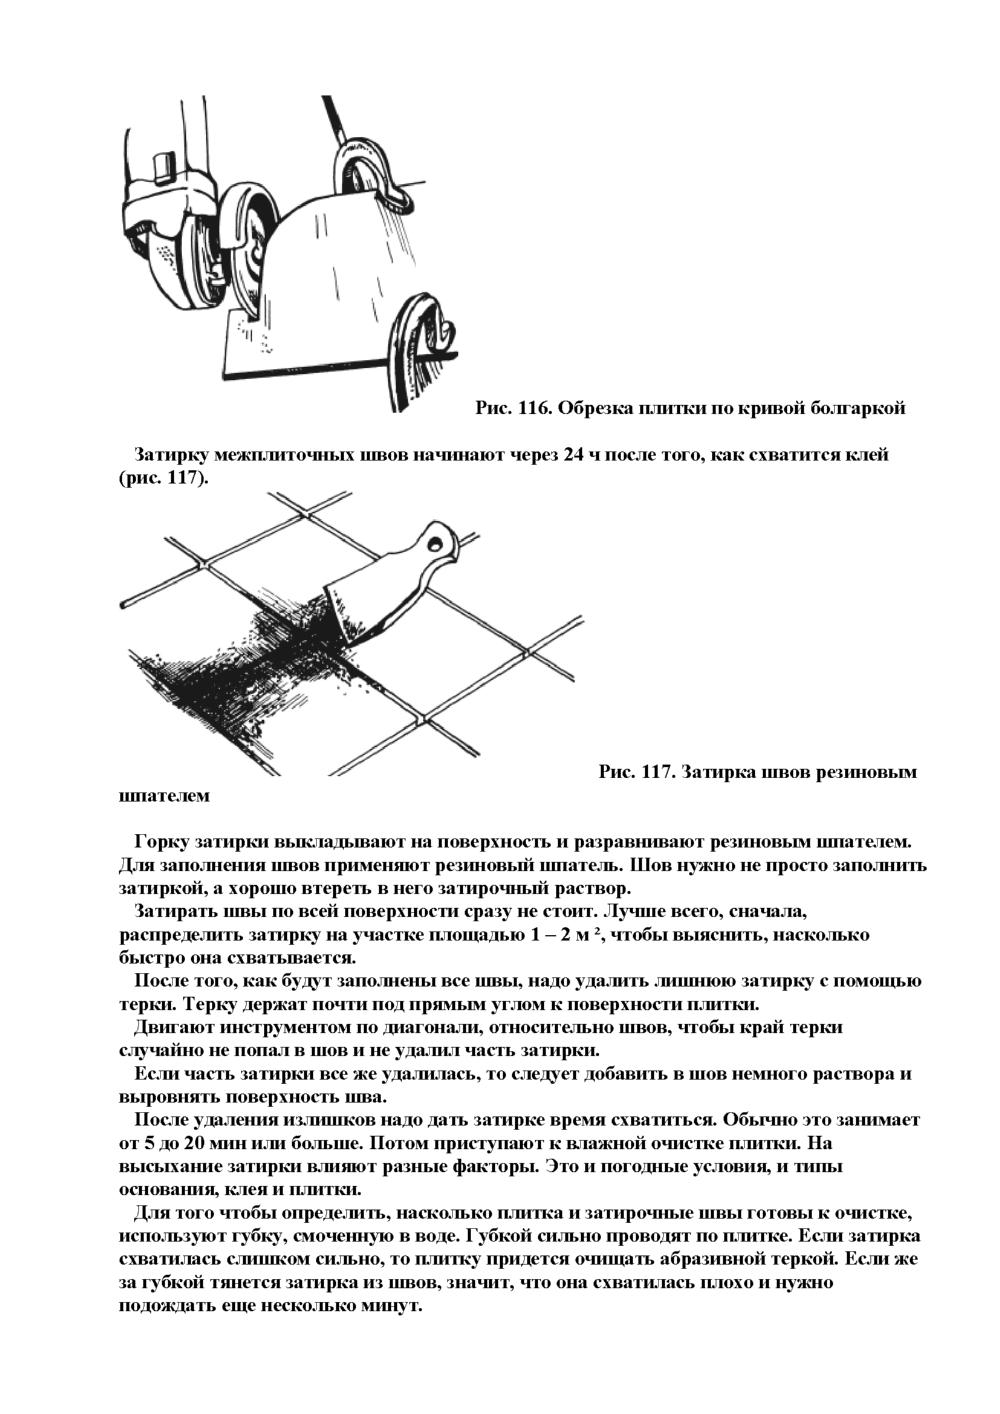 http://i5.imageban.ru/out/2013/11/26/5f516912025d8021e560b67540222964.jpg